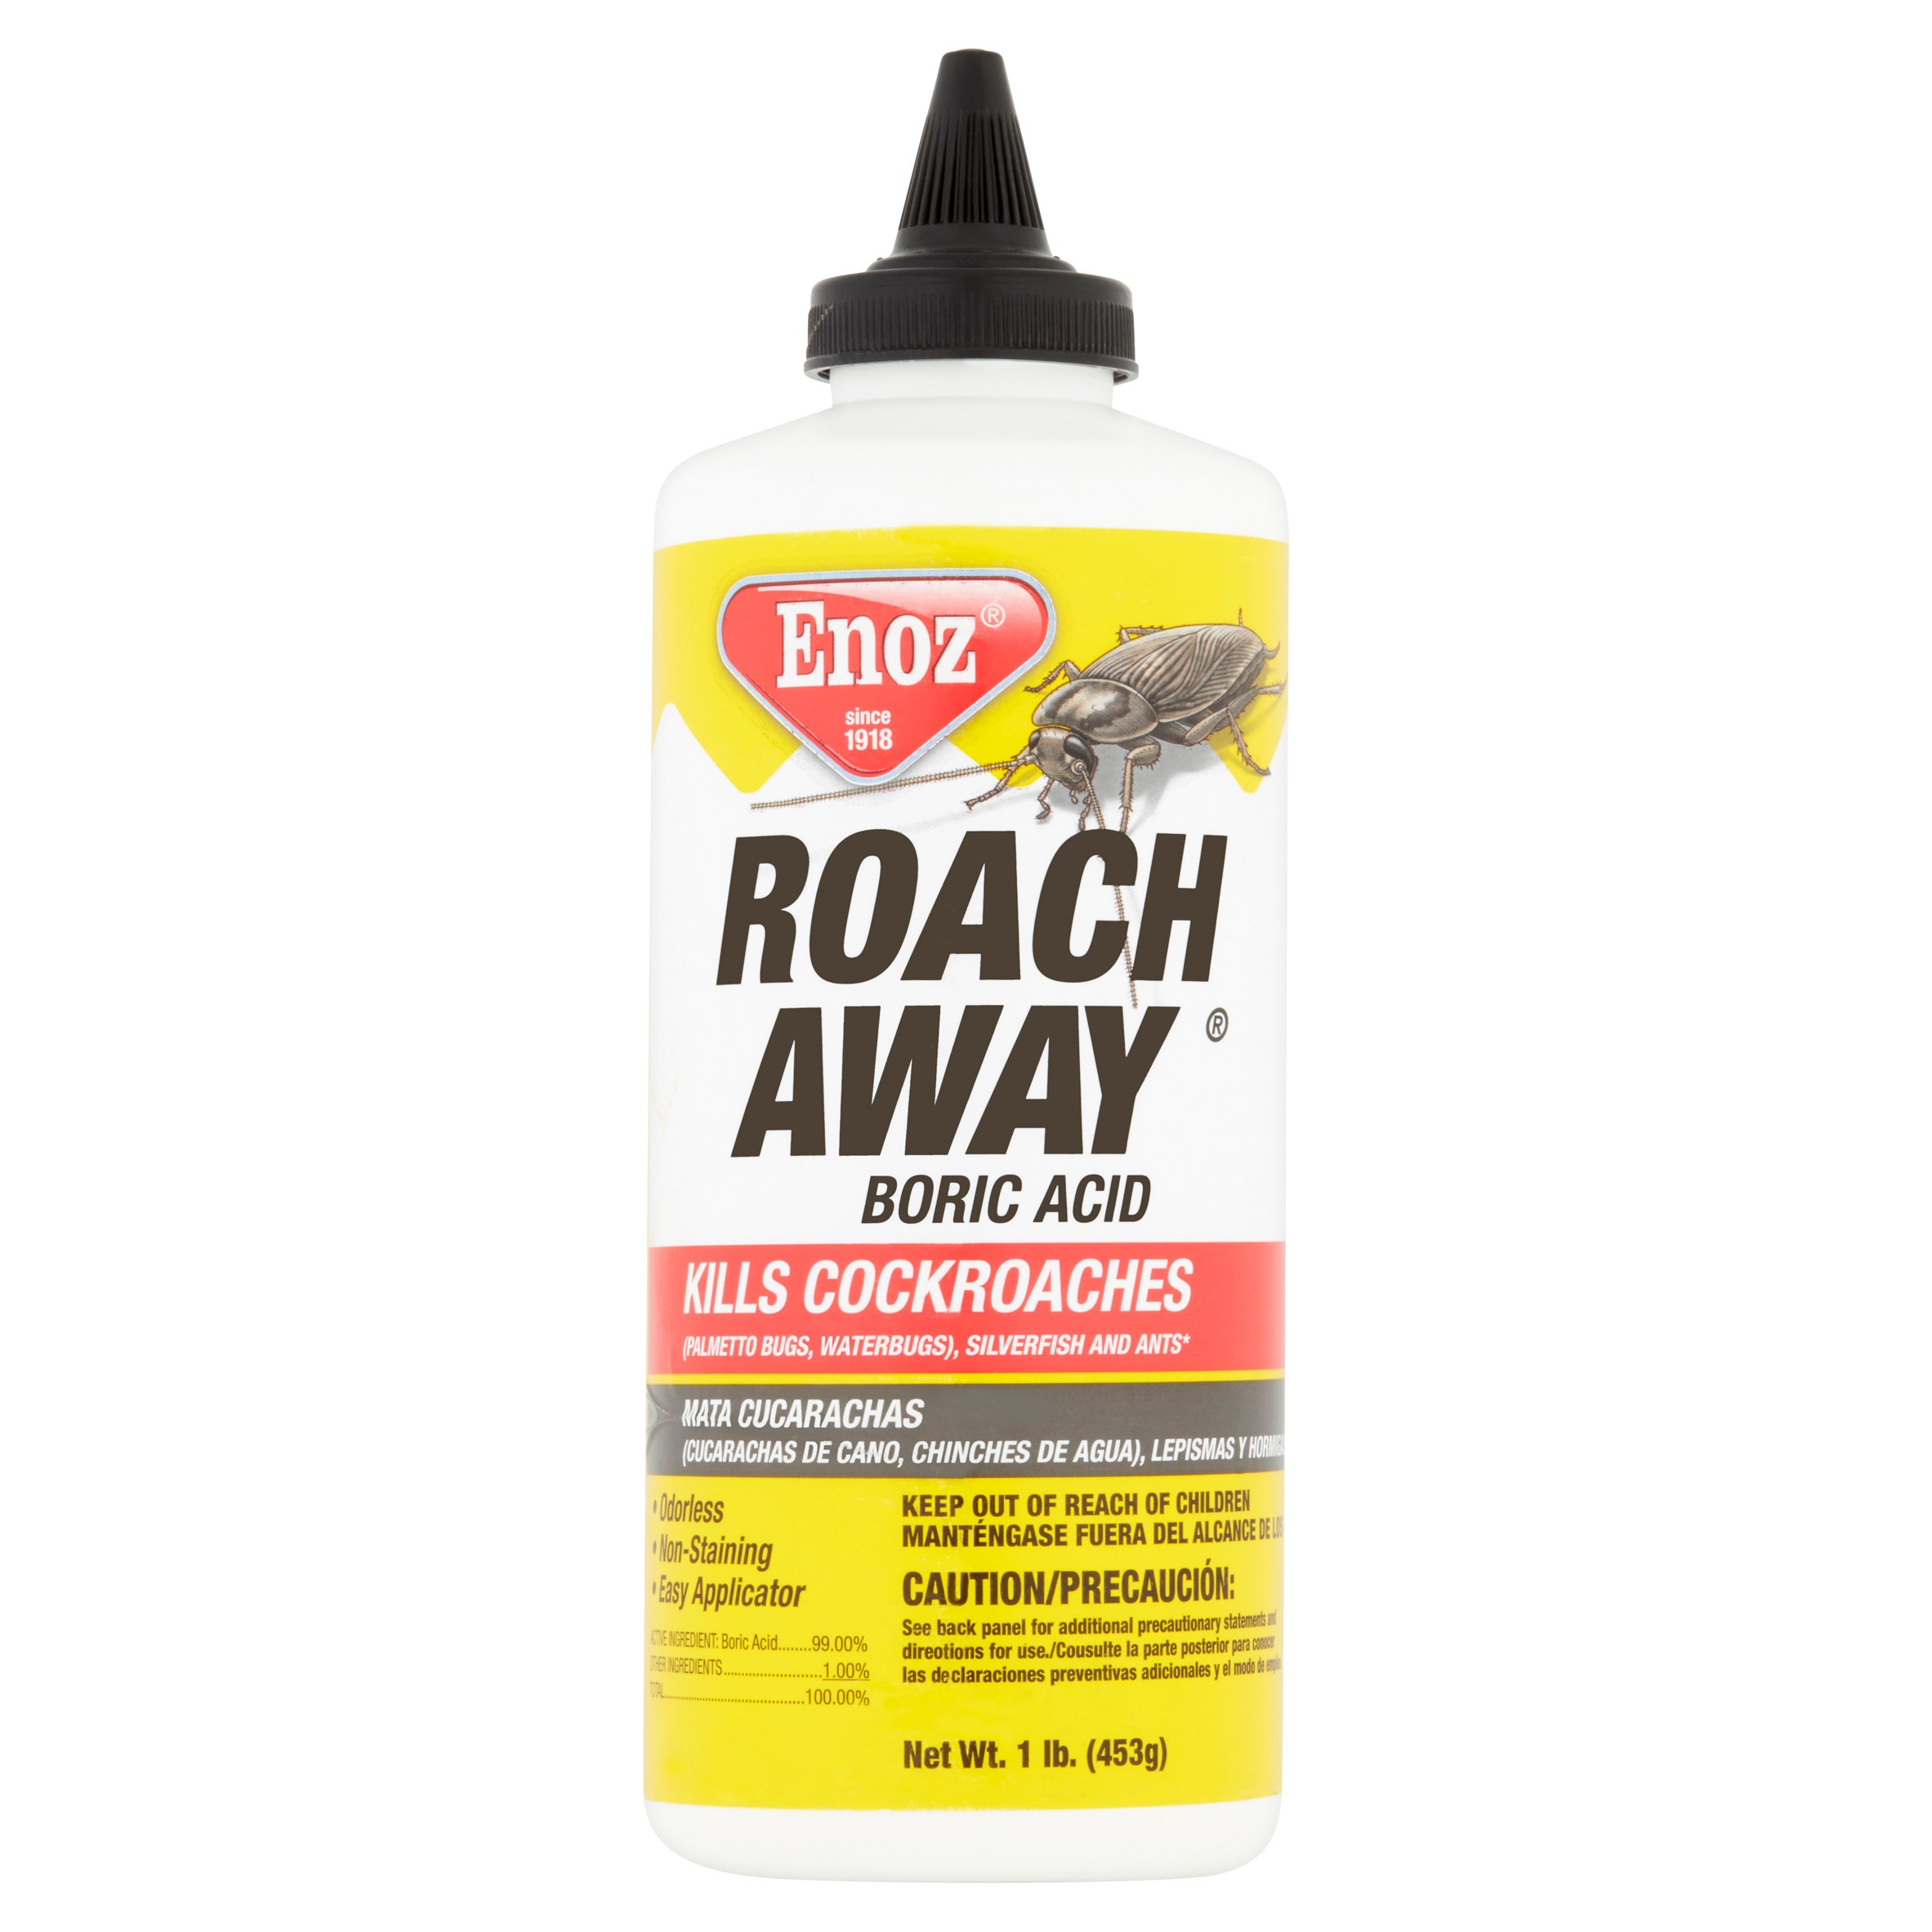 Enoz Roach Away Boric Acid, 1 lb - Walmart.com at Walmart - Vision Center in Connersville, IN   Tuggl